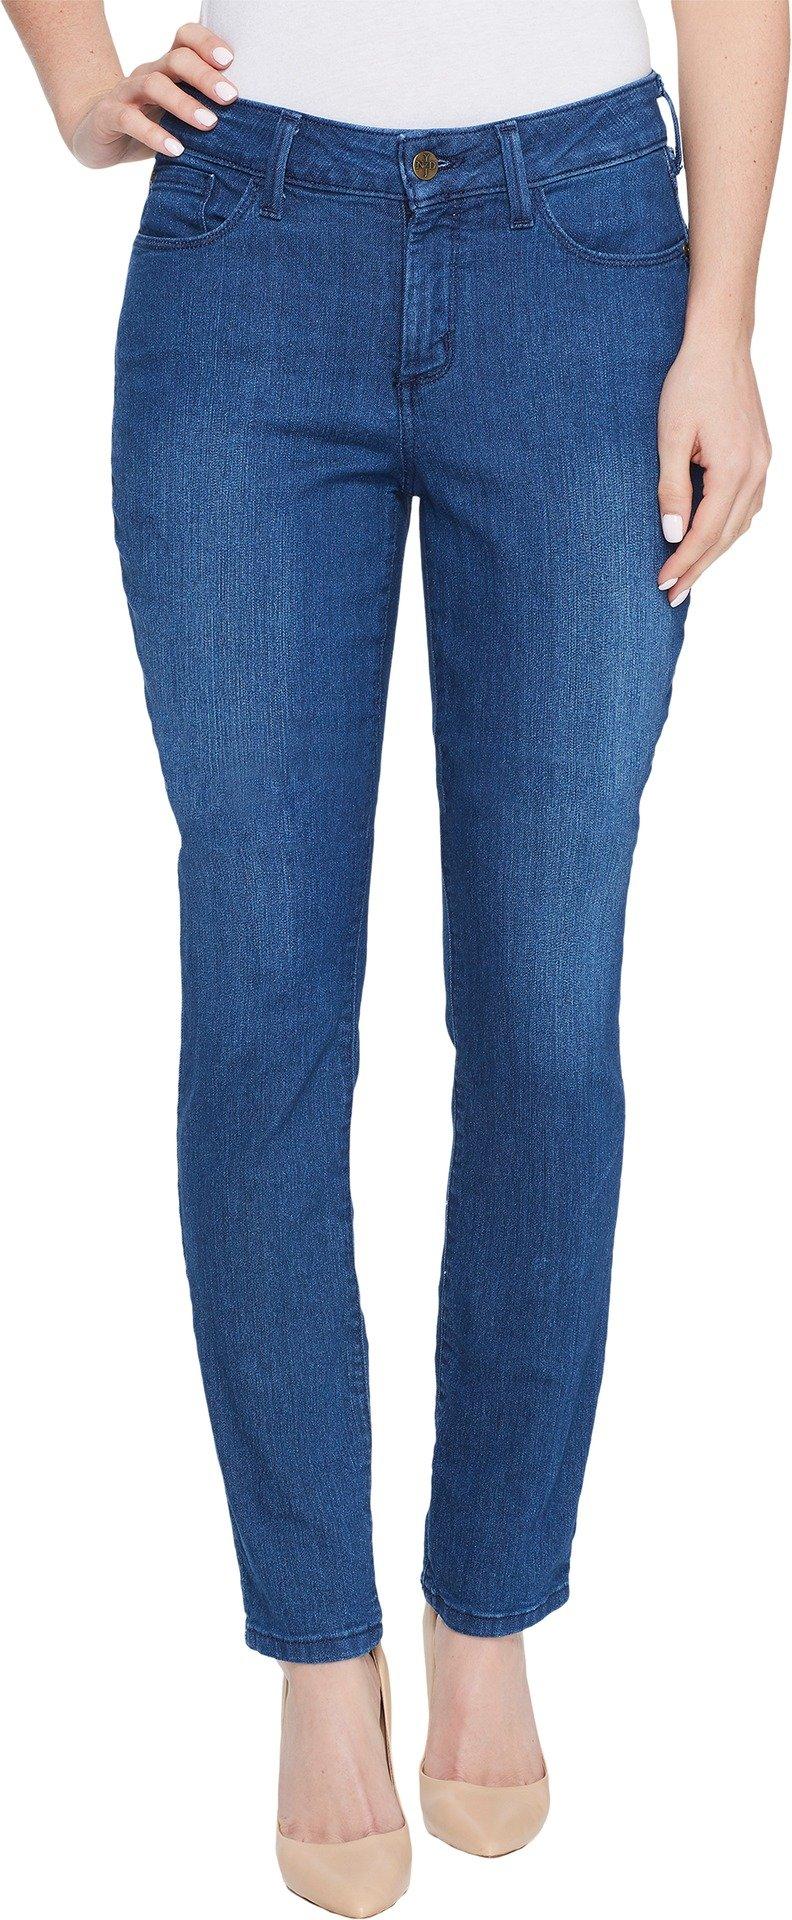 NYDJ Women's Alina Legging Fit Skinny Jeans, Legacy, 8